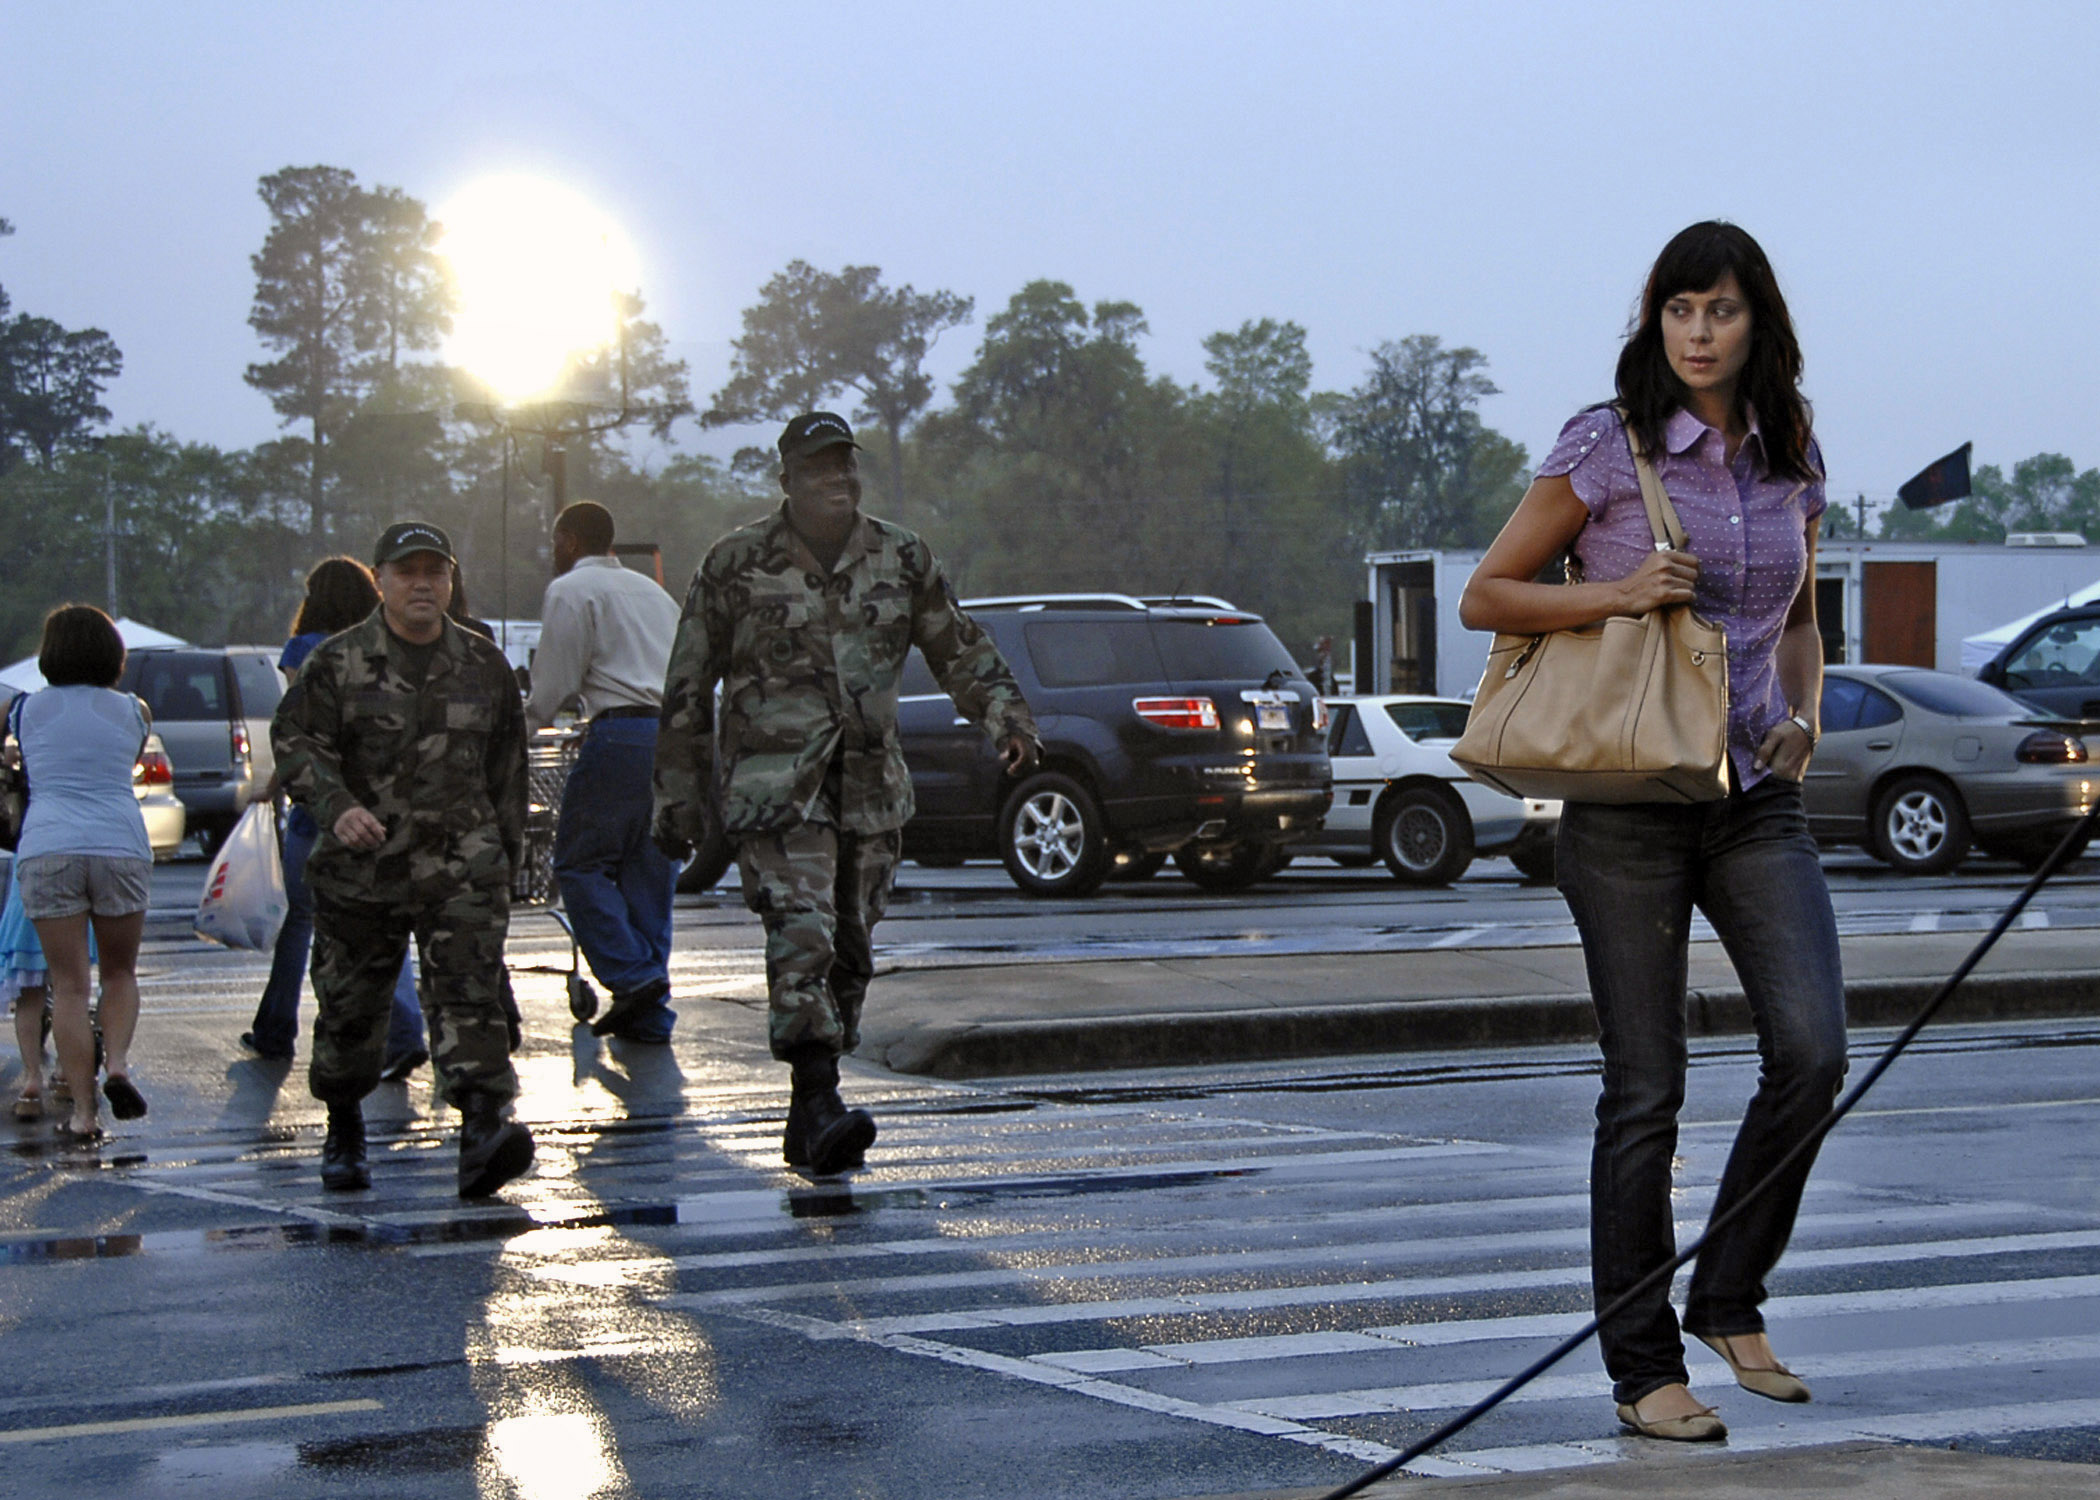 Army Wives Films On Charleston U S Air Force Article Display